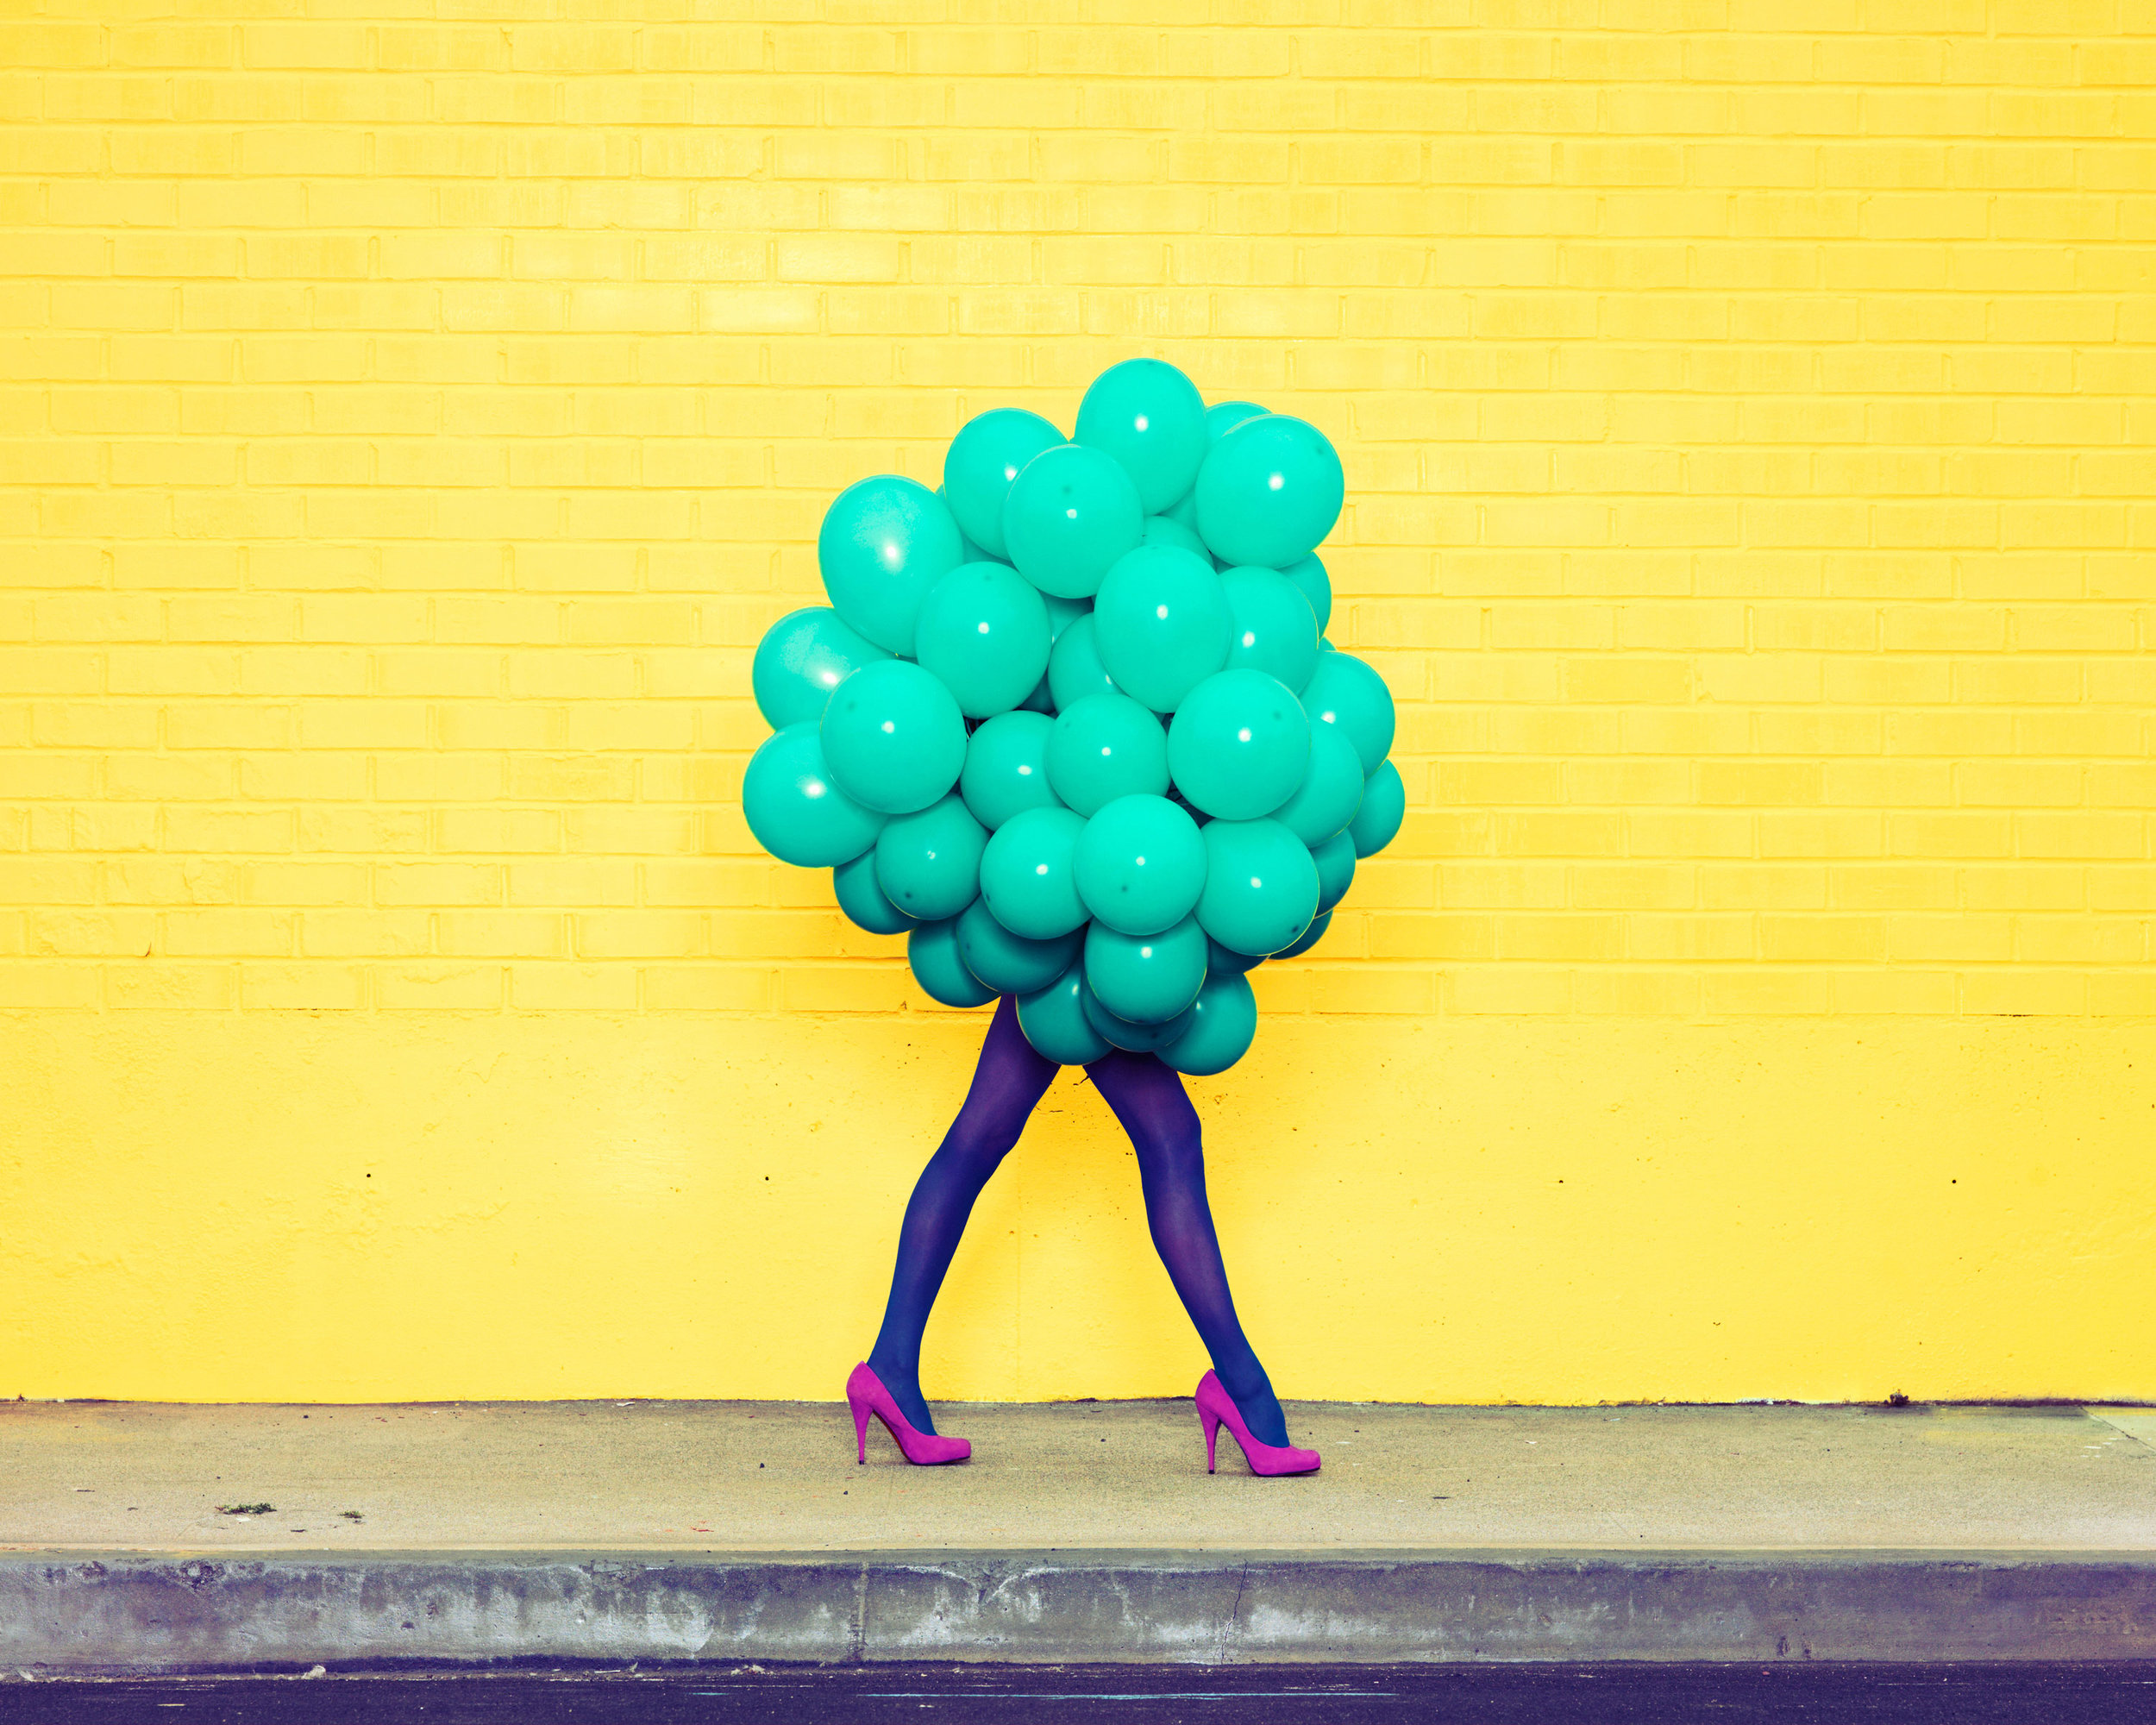 Ramona Rosales,  Je Ne Suis Pas Seul Sans Toi (Green Balloons) , 2013  Digital pigment print, 30 x 40 in, edition of 5; 20 x 24 in, edition of 5; 8 x 10 in, edition of 250   Inquire